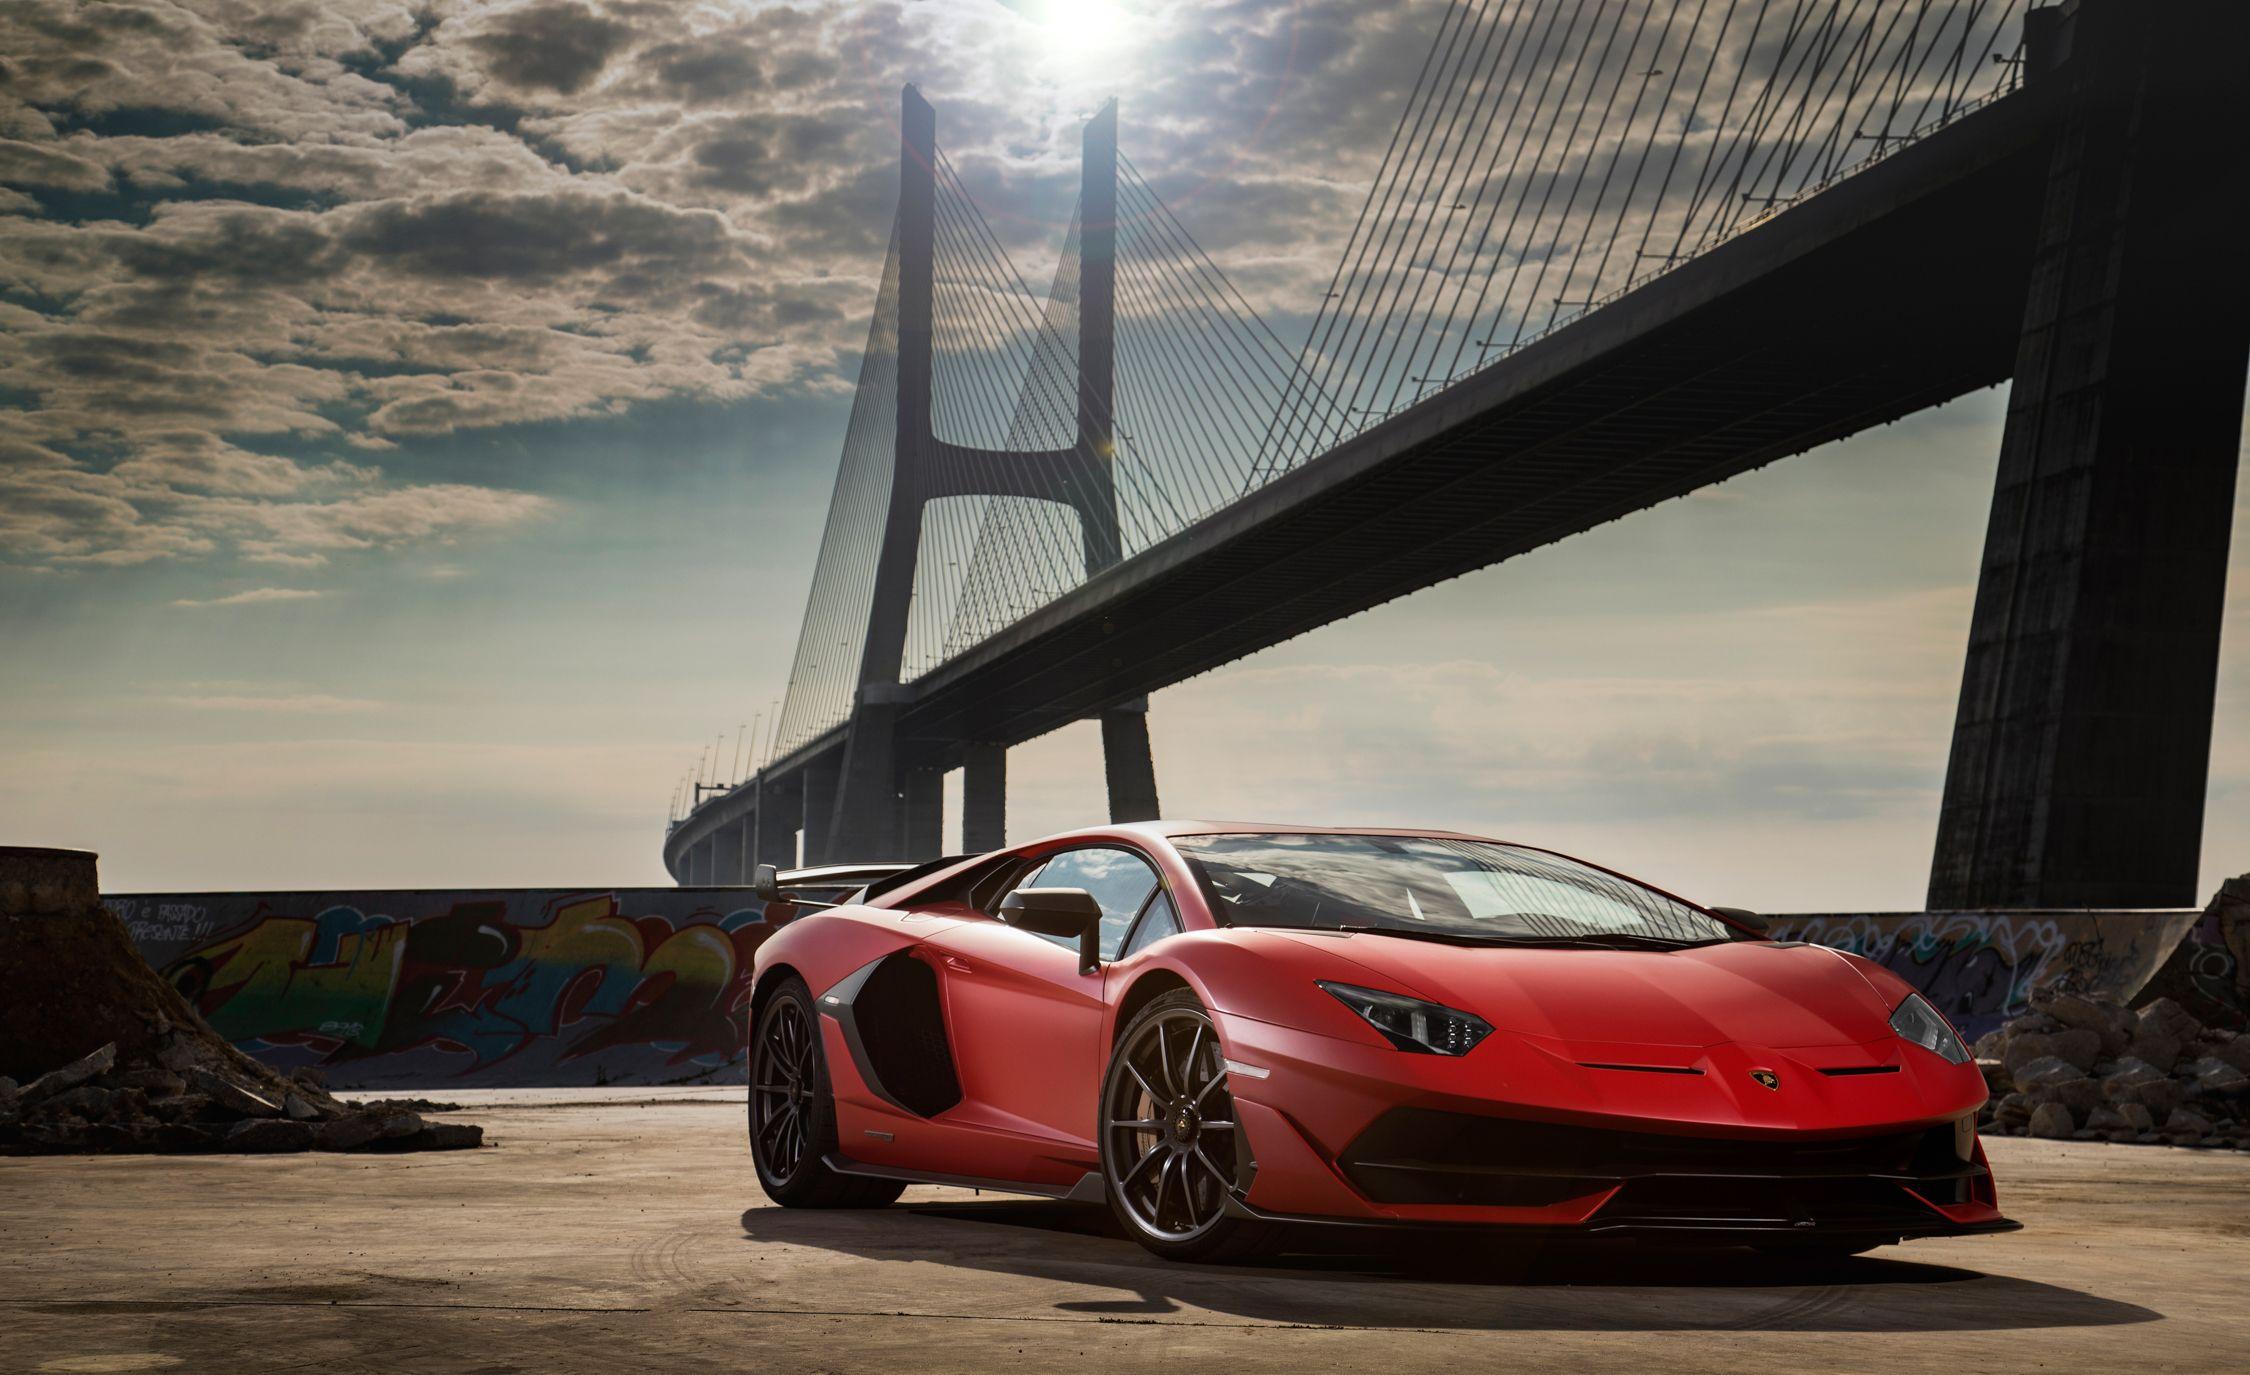 The 2020 Lamborghini Aventador Will Be Heavier, Hybrid, But Still a Supercar